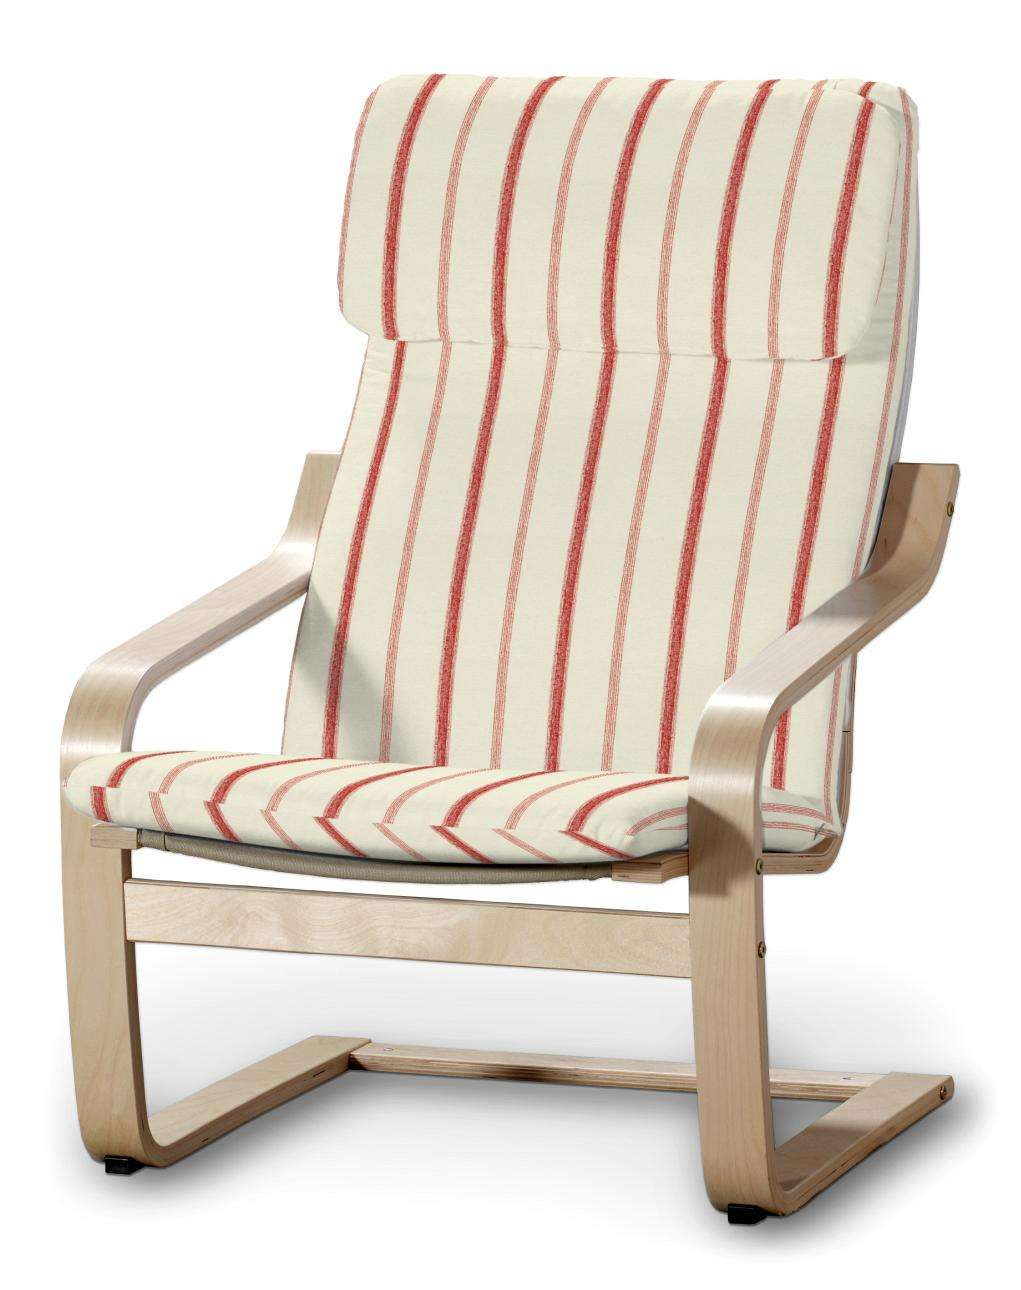 Poduszka na fotel Poäng Fotel Poäng w kolekcji Avinon, tkanina: 129-15